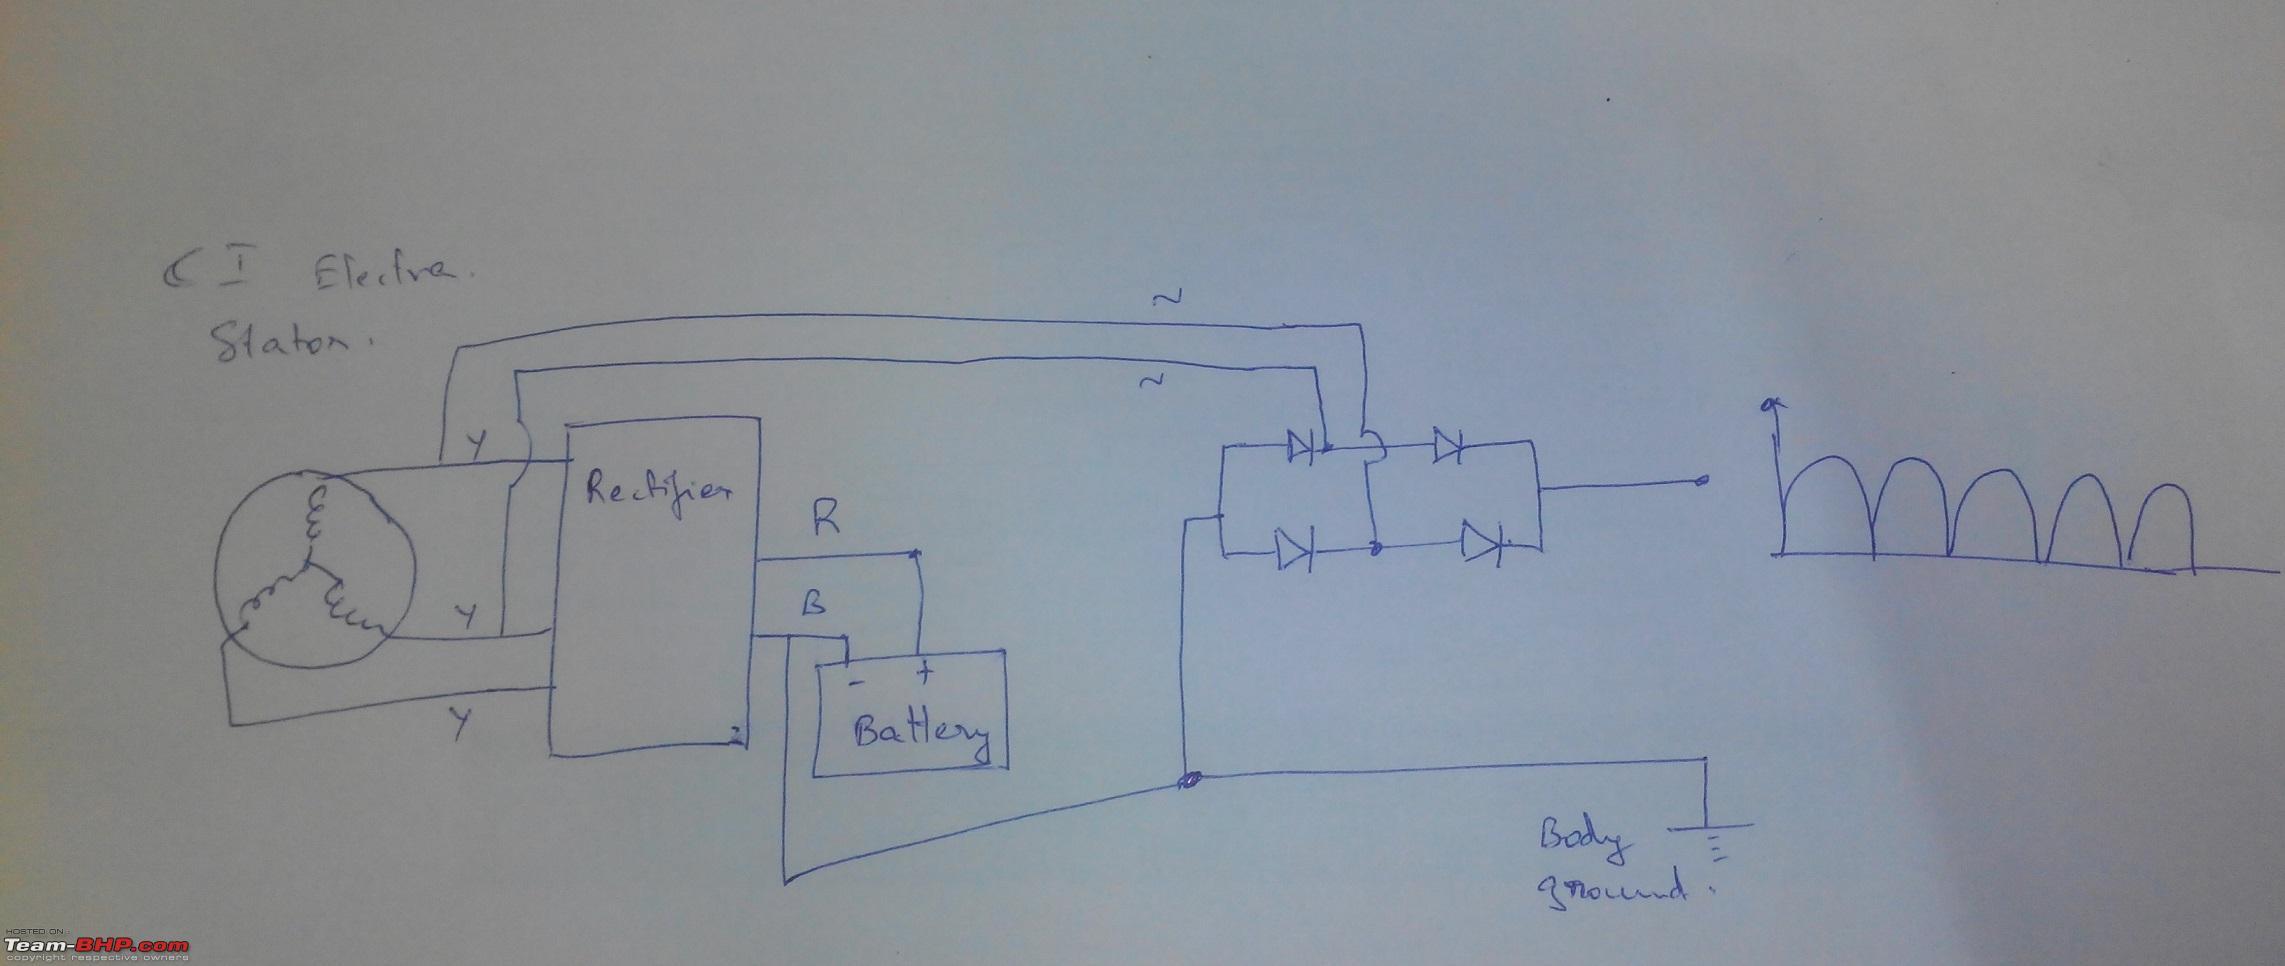 brain wiring diagram 1980 honda ct70 royal enfield 350 electra: restoration & upgrades - page 2 team-bhp